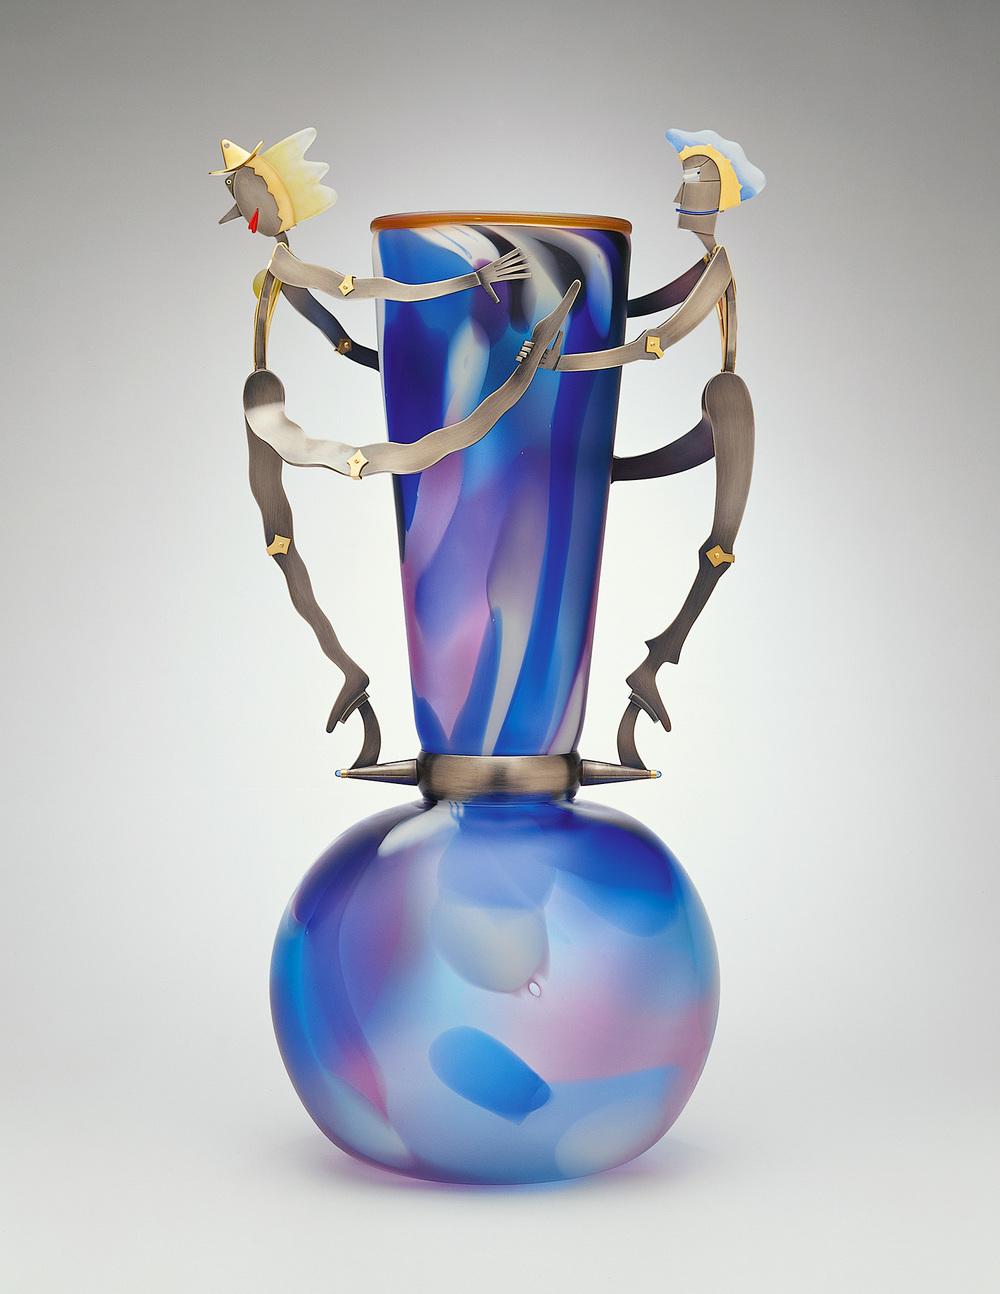 "Freddo and Calda   2001. Blown glass, nickel and gold-plated bronze, Vitrolite, pate de verre. 34½ x 18 x 14"""